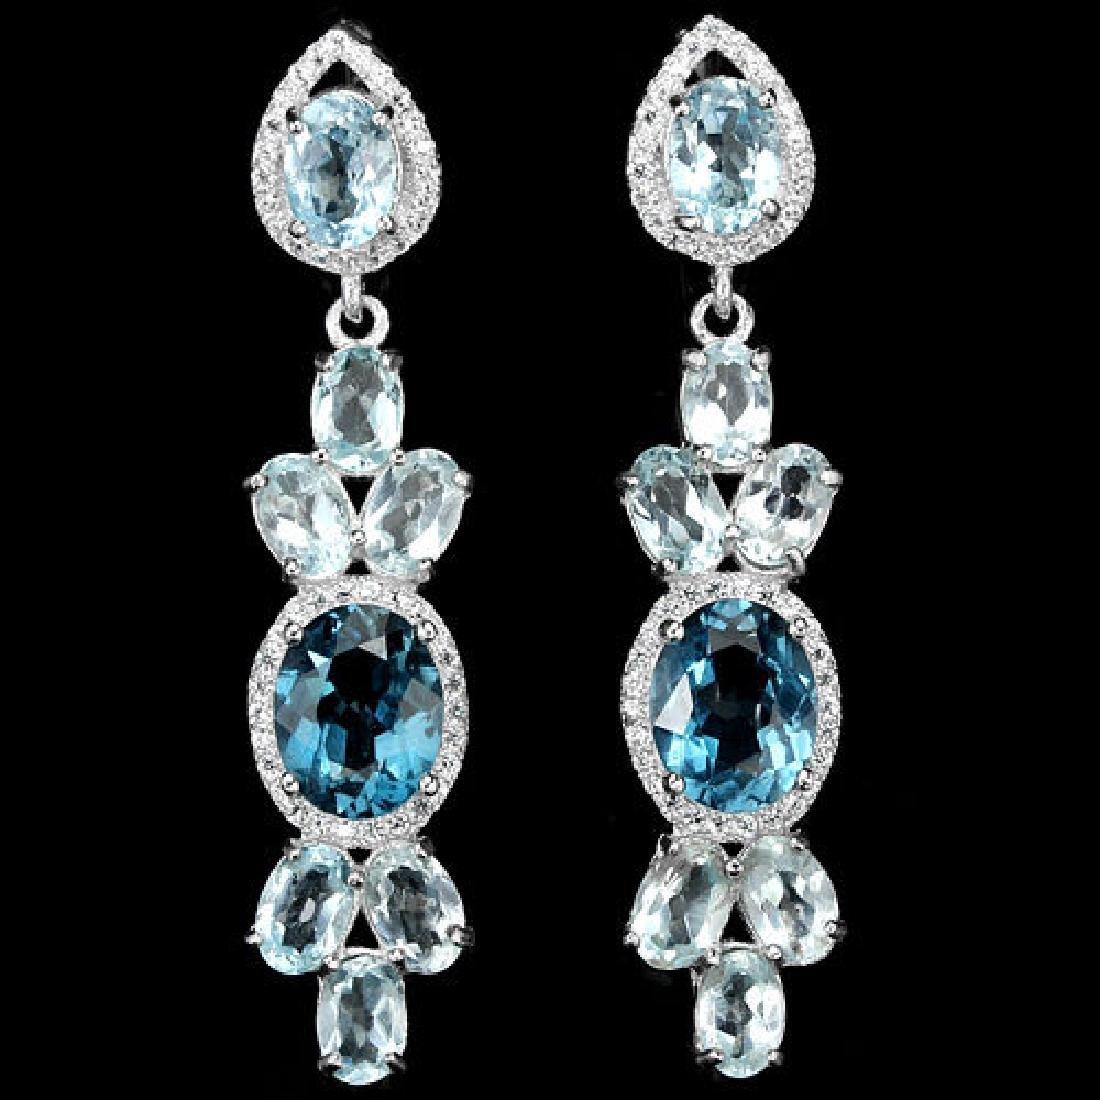 Natural Sky & London Topaz 50 Carats  Earrings